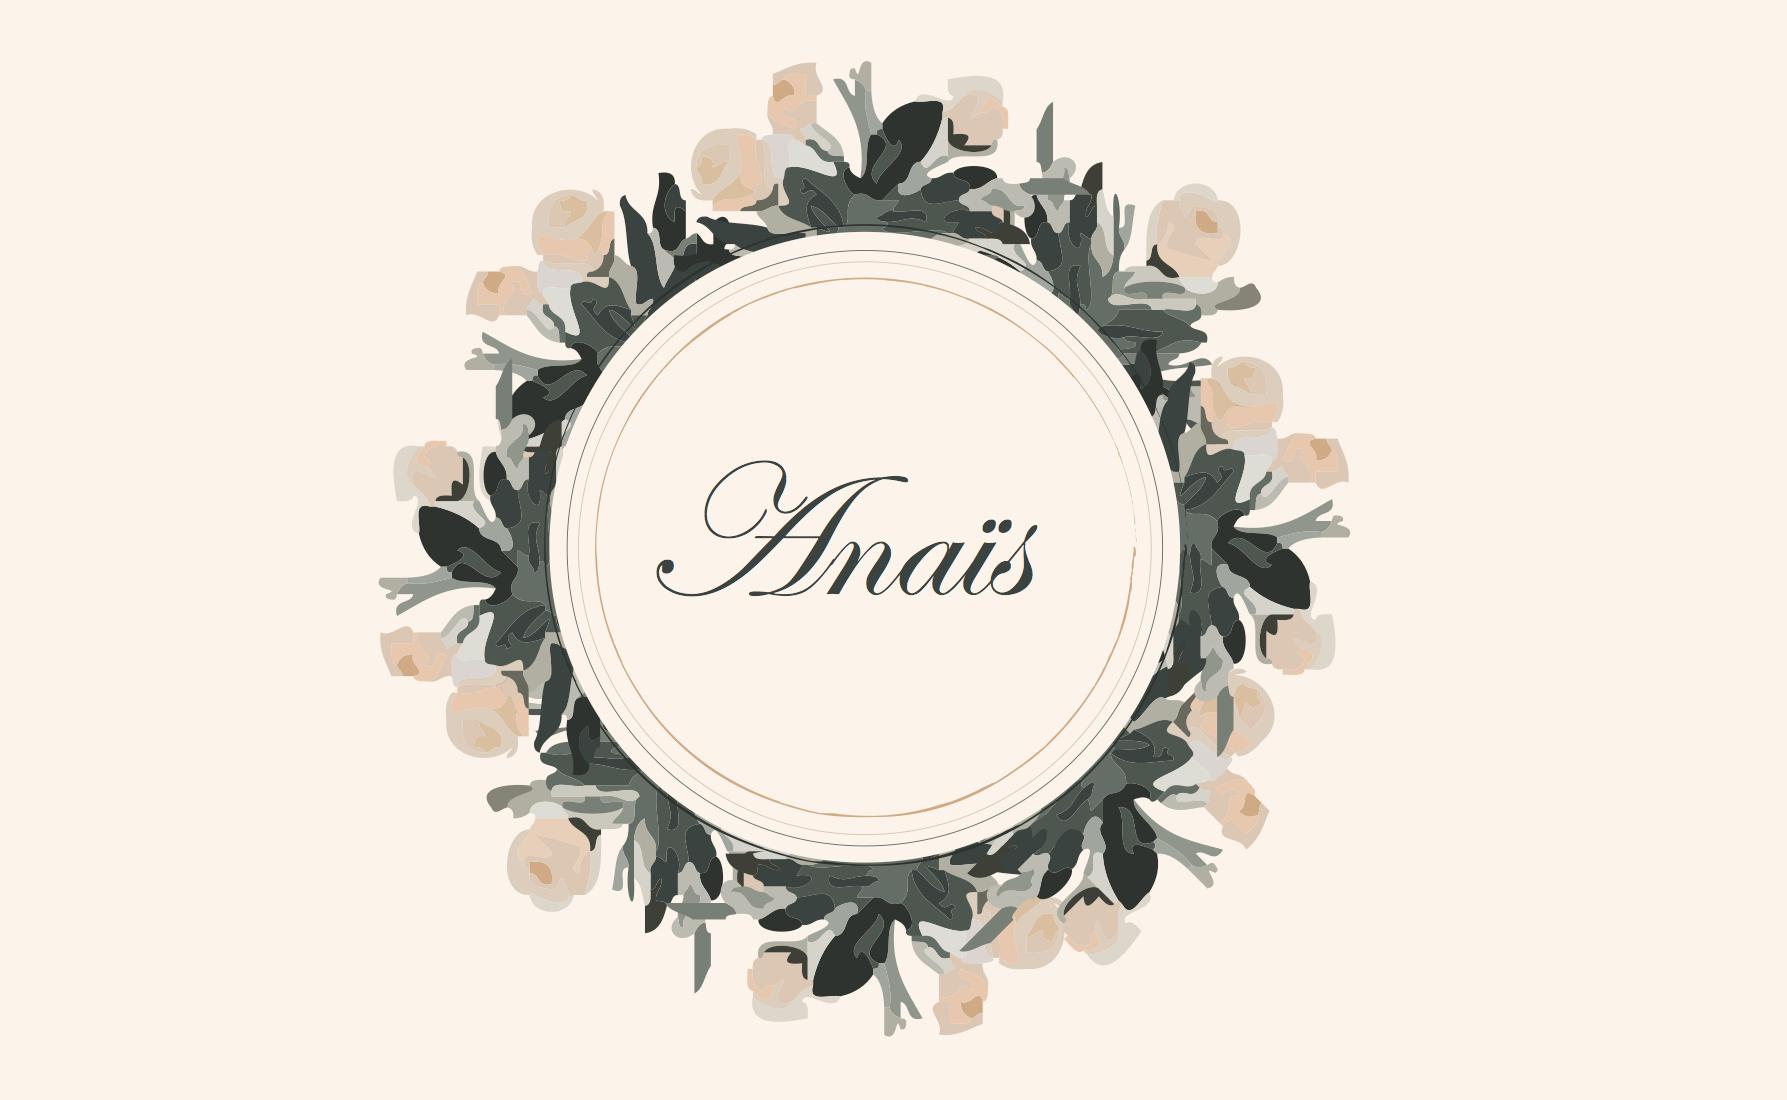 Anaïs_rectangulaire_recto_1.png